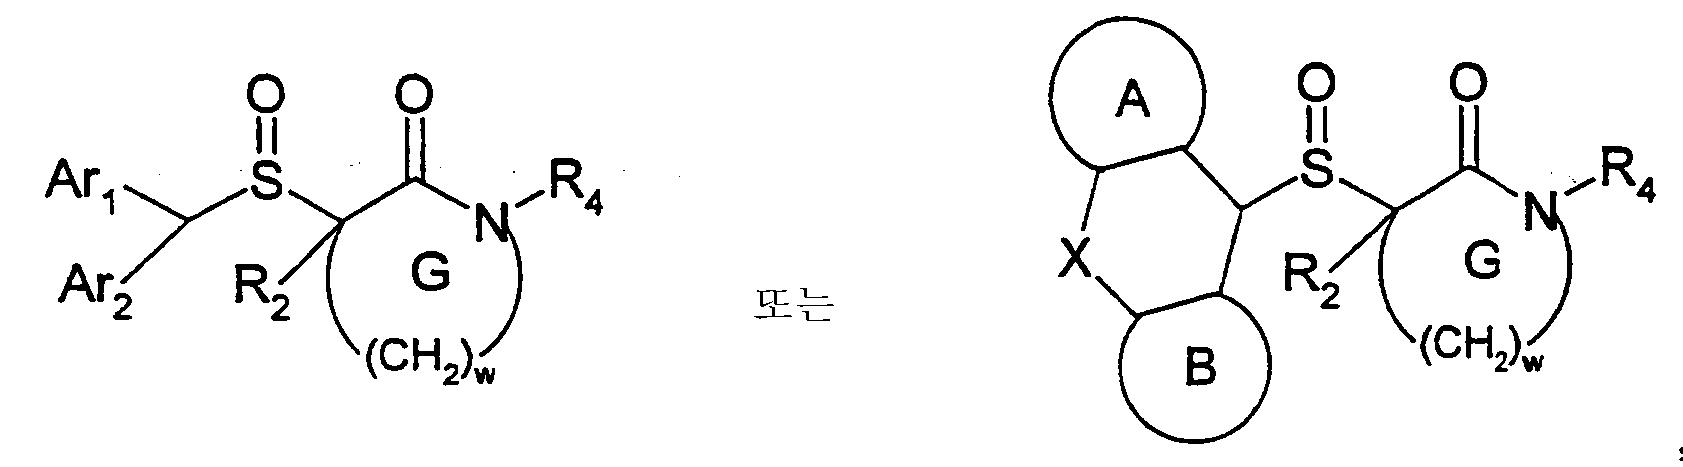 Figure 112002037774251-pct00012